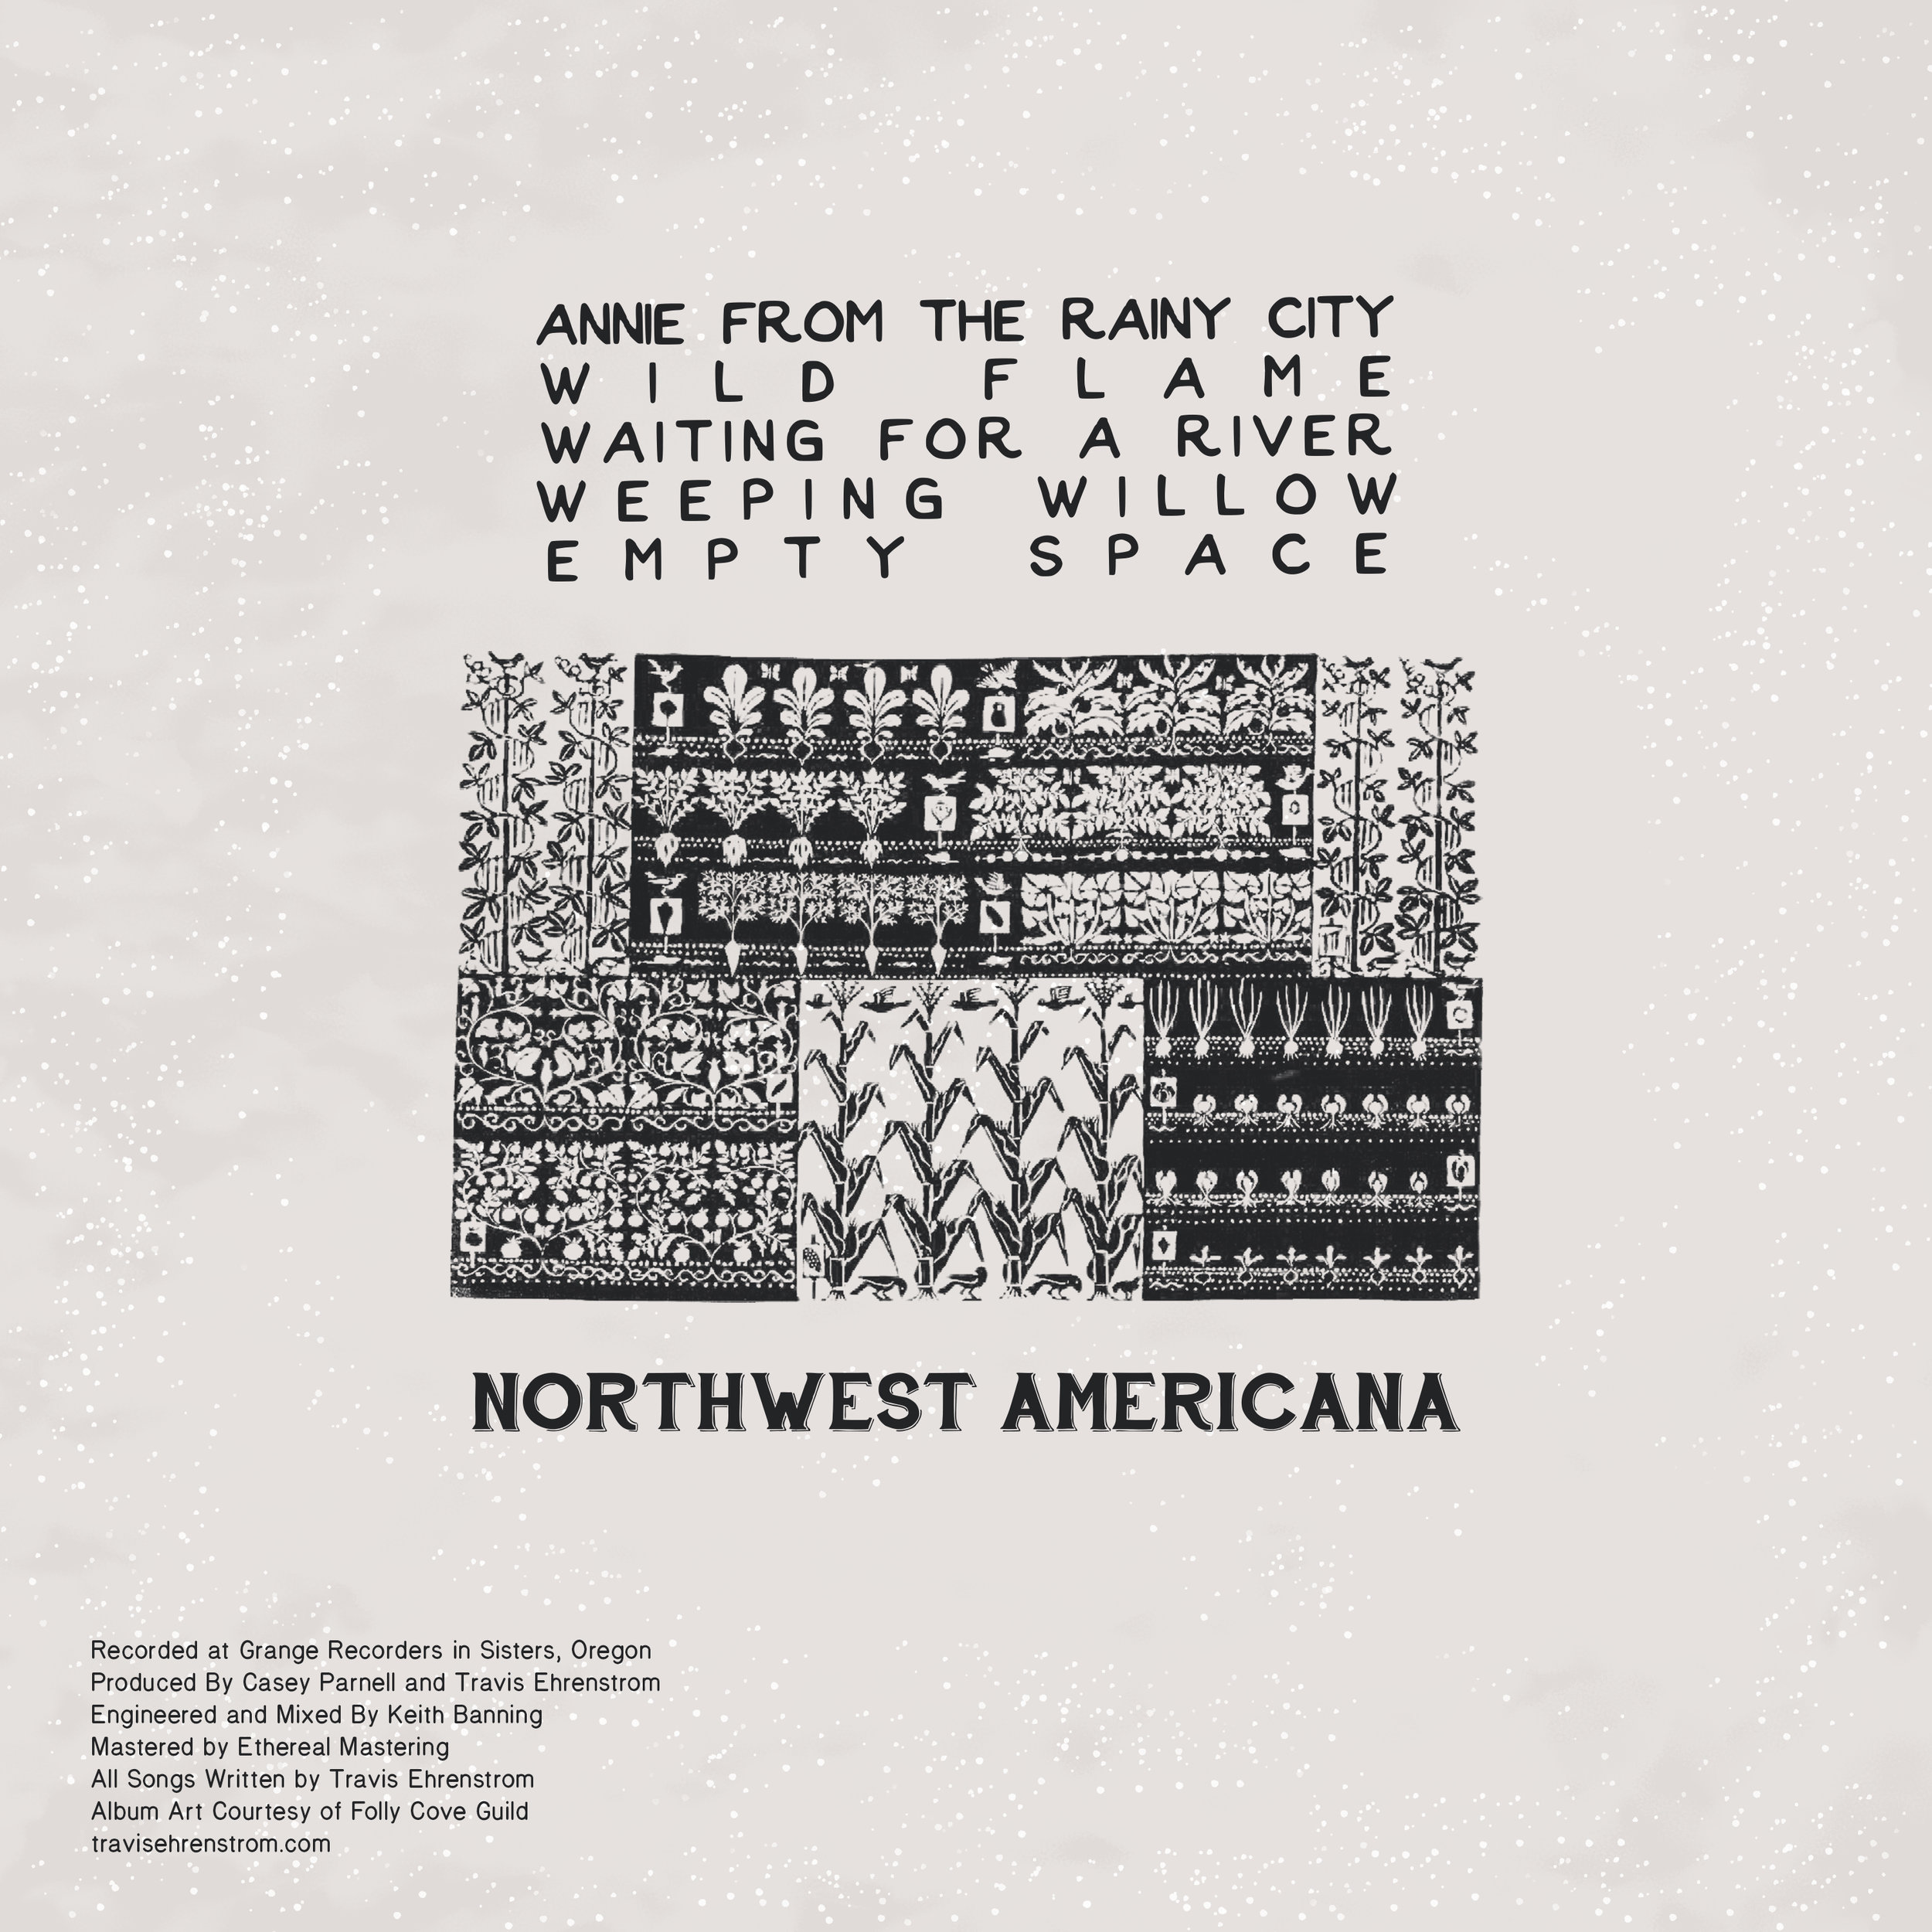 NorthwestAmericanaback.jpg